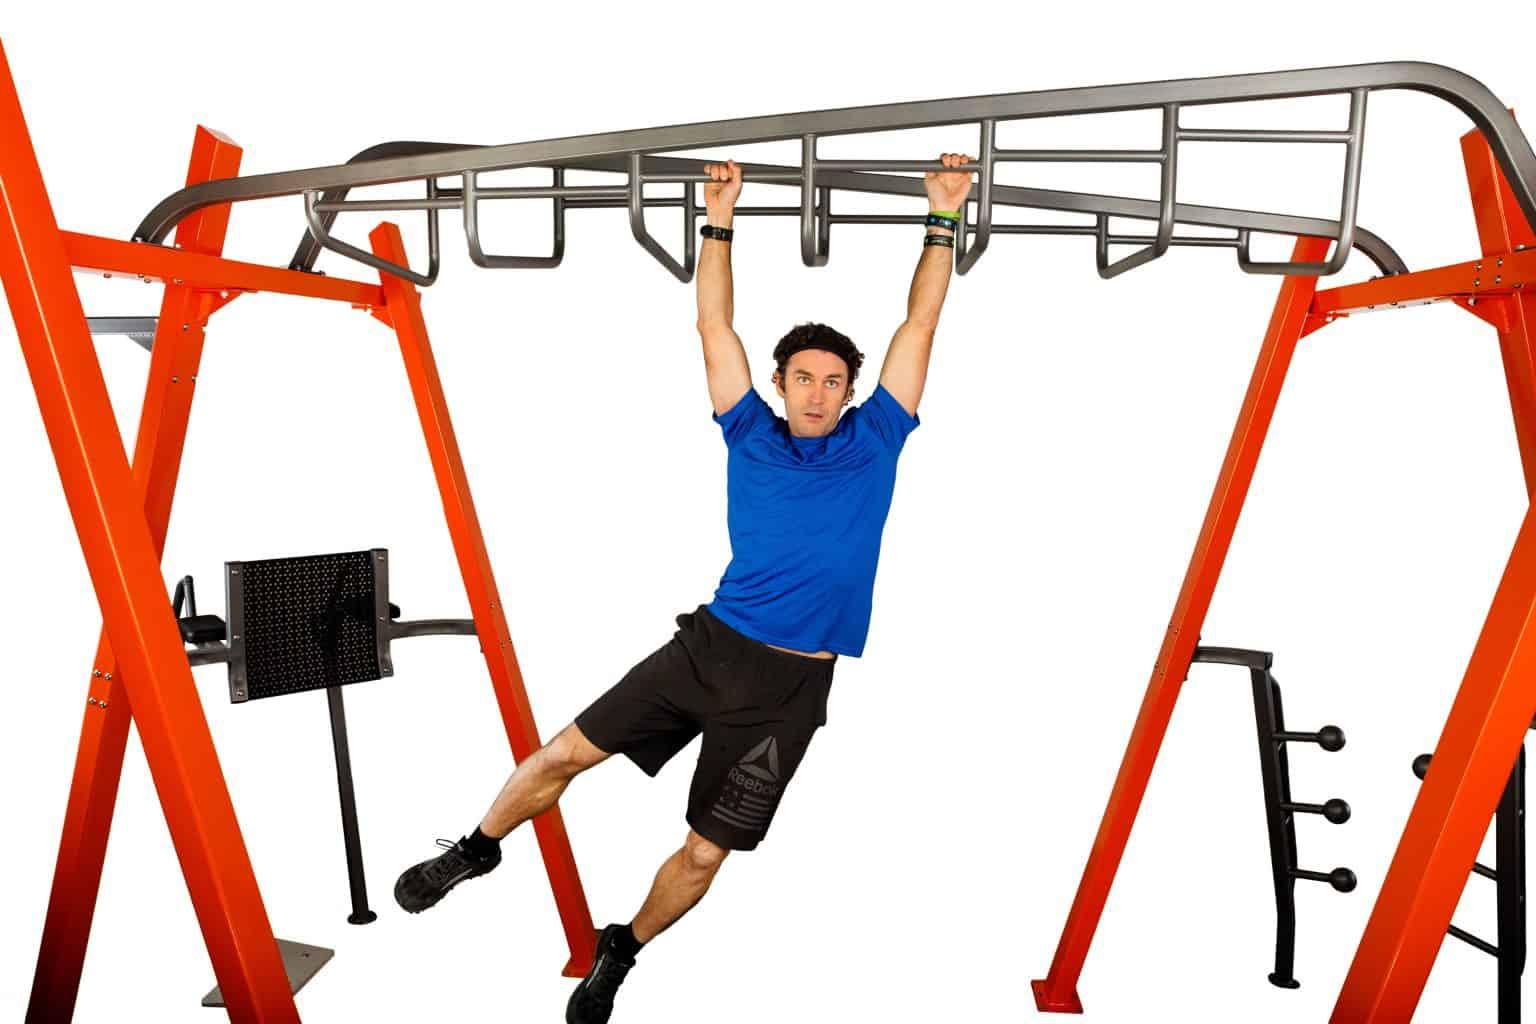 outdoor-fitness-equipment_49644069982_o-1536x1024